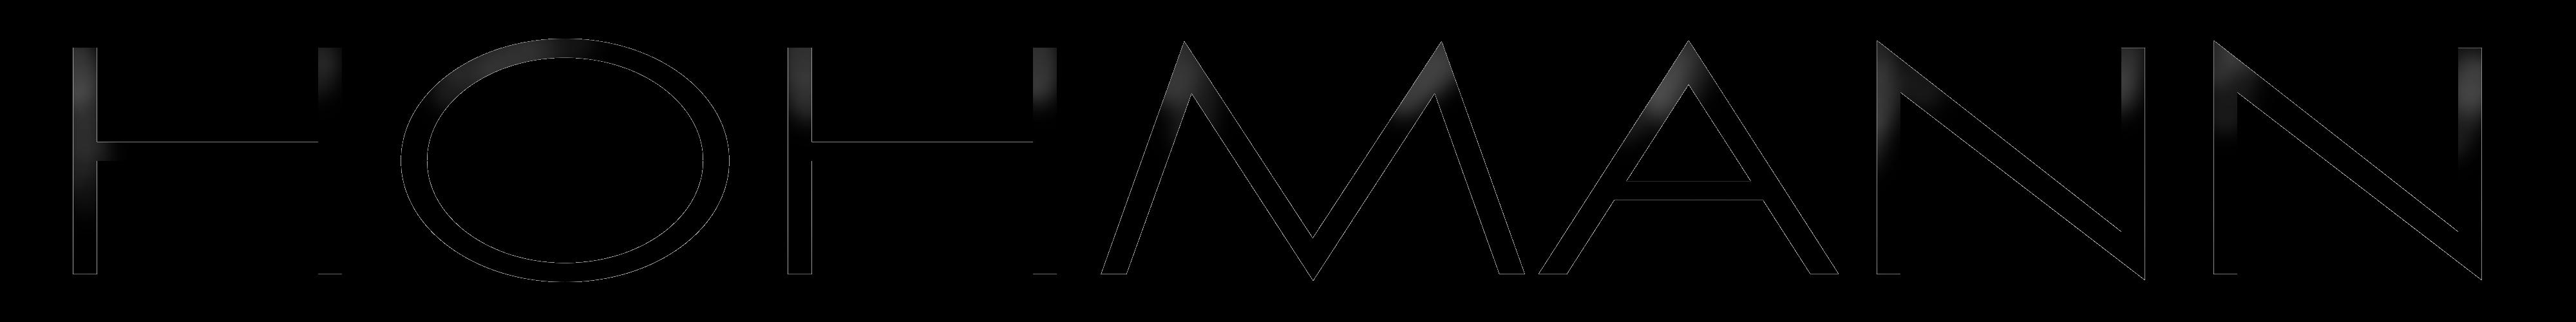 Logo metallic no background - black